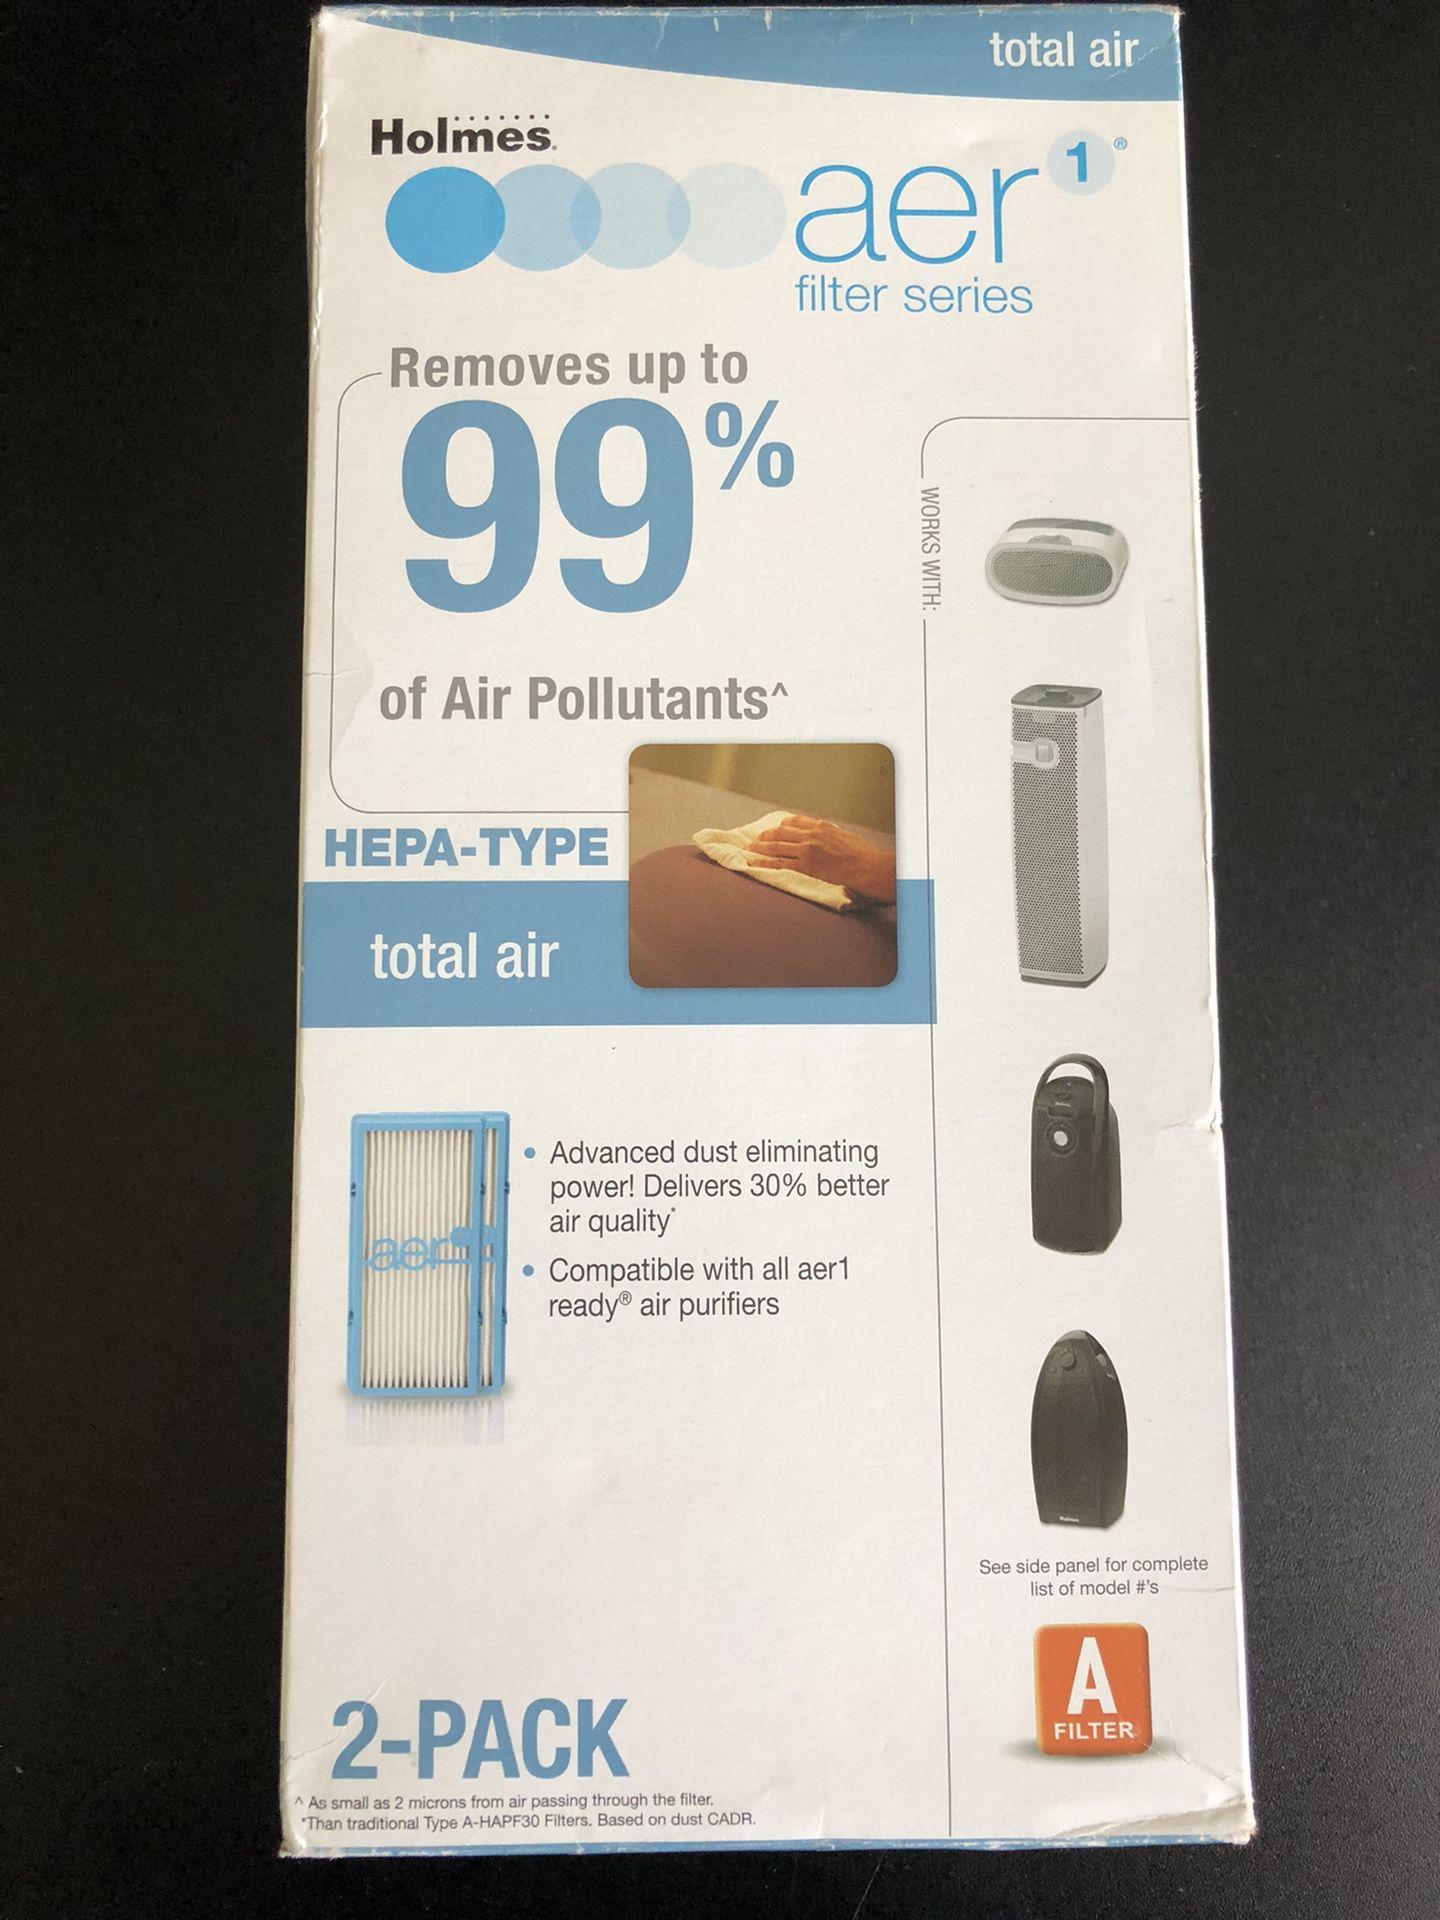 Holmes AER1 Total Air HEPA Type Filter 2 Pack